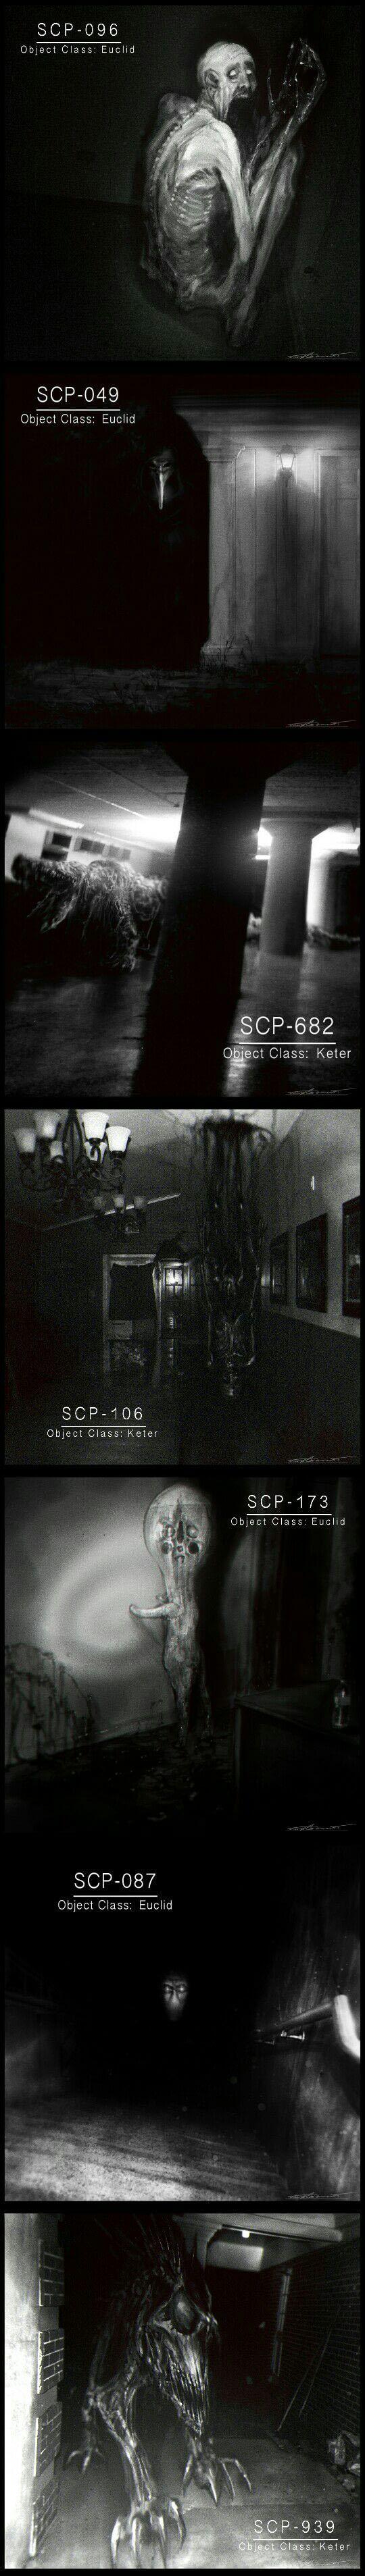 Creepy SCP monsters by Cinemamind